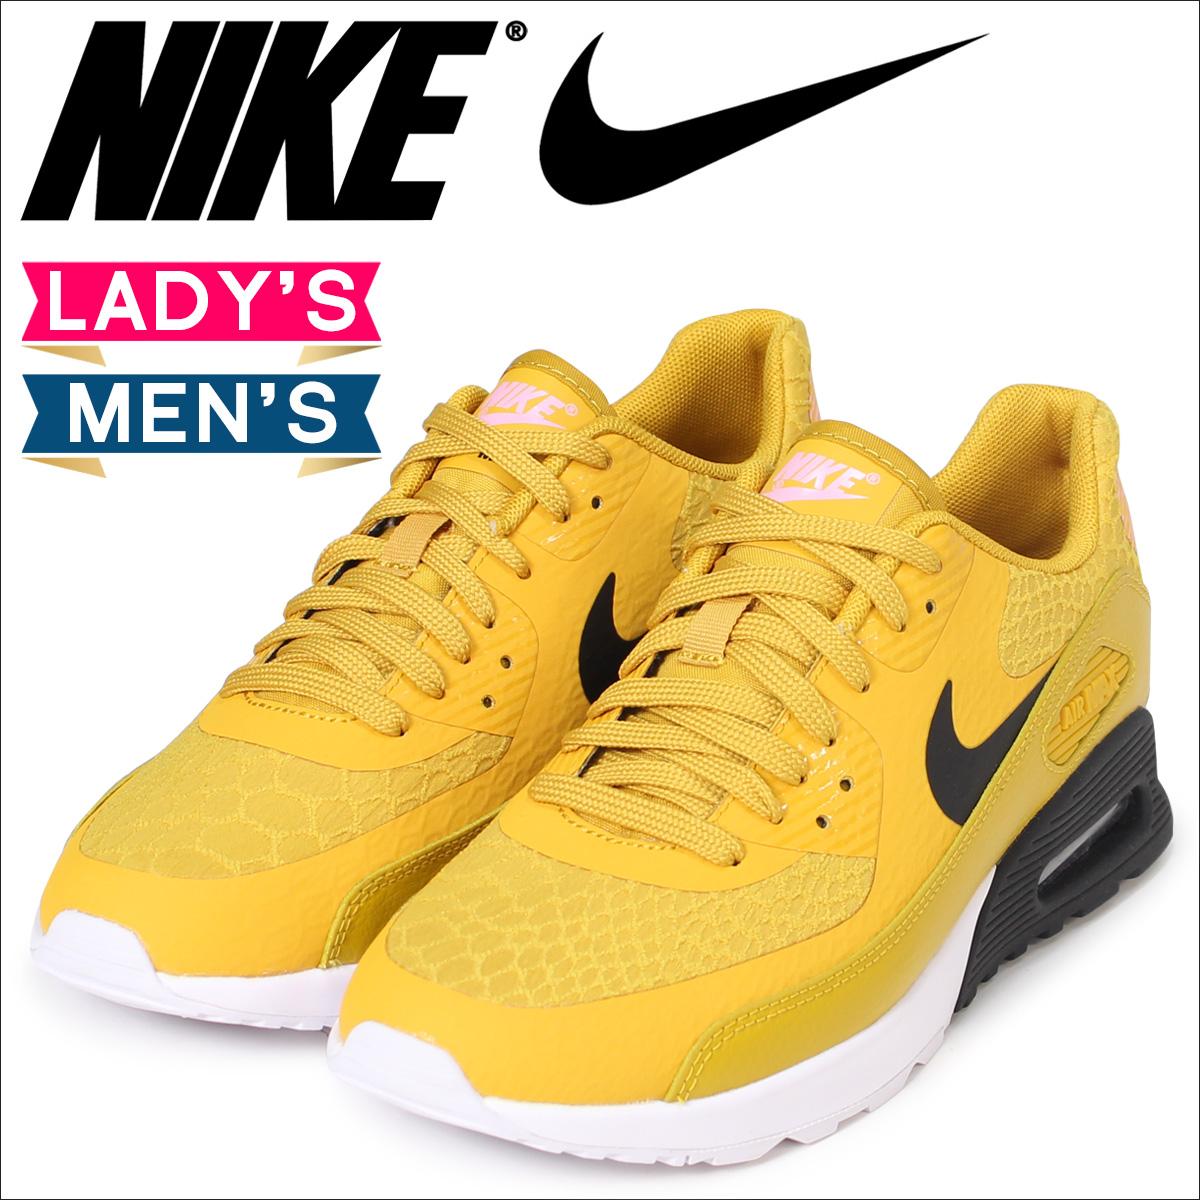 Nike shopping online usa